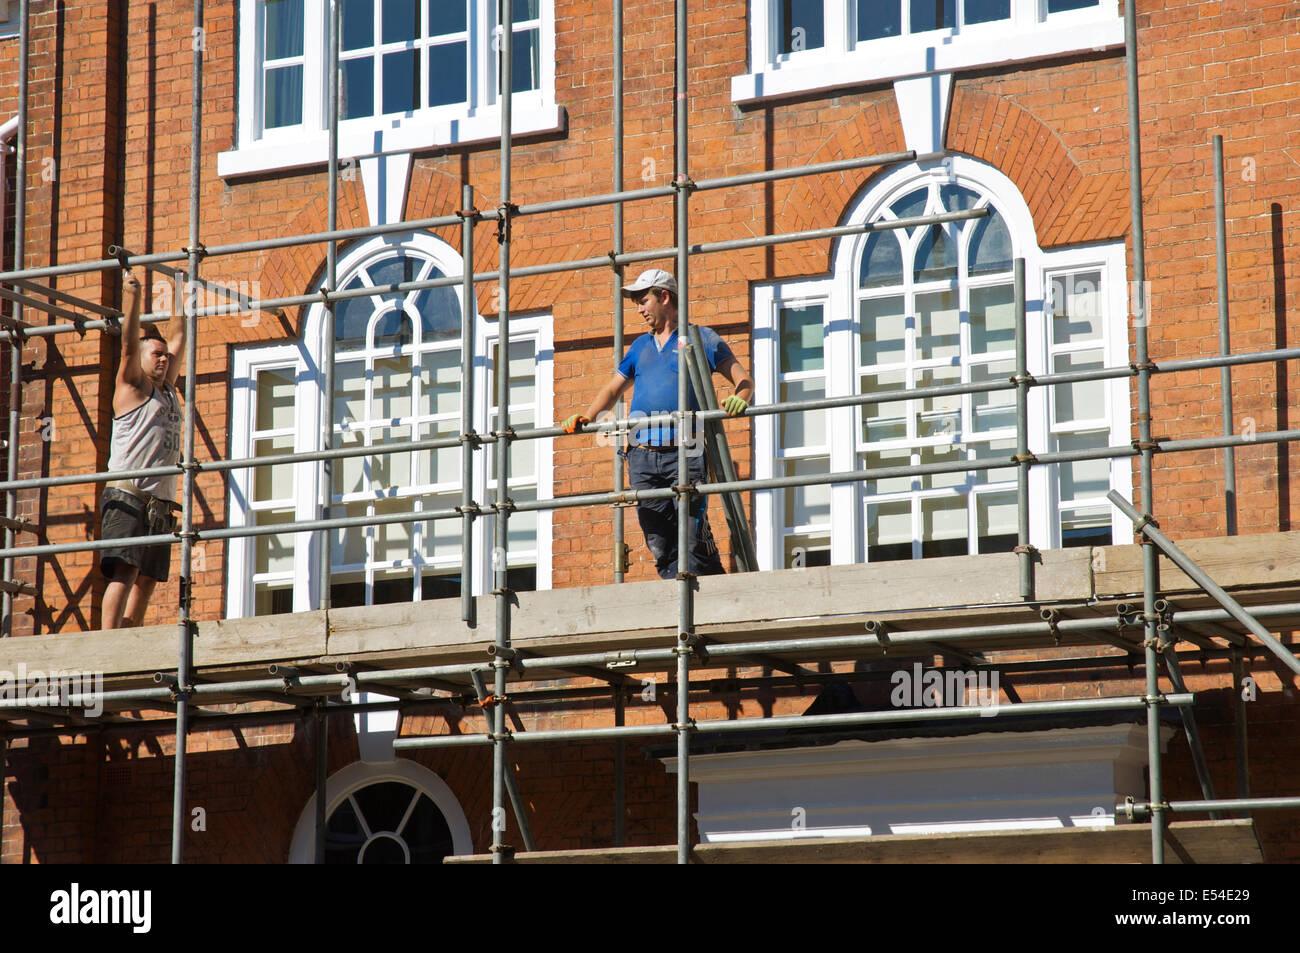 Two men dismantling scaffolding on Georgian building, Ludlow, Shropshire, England UK - Stock Image